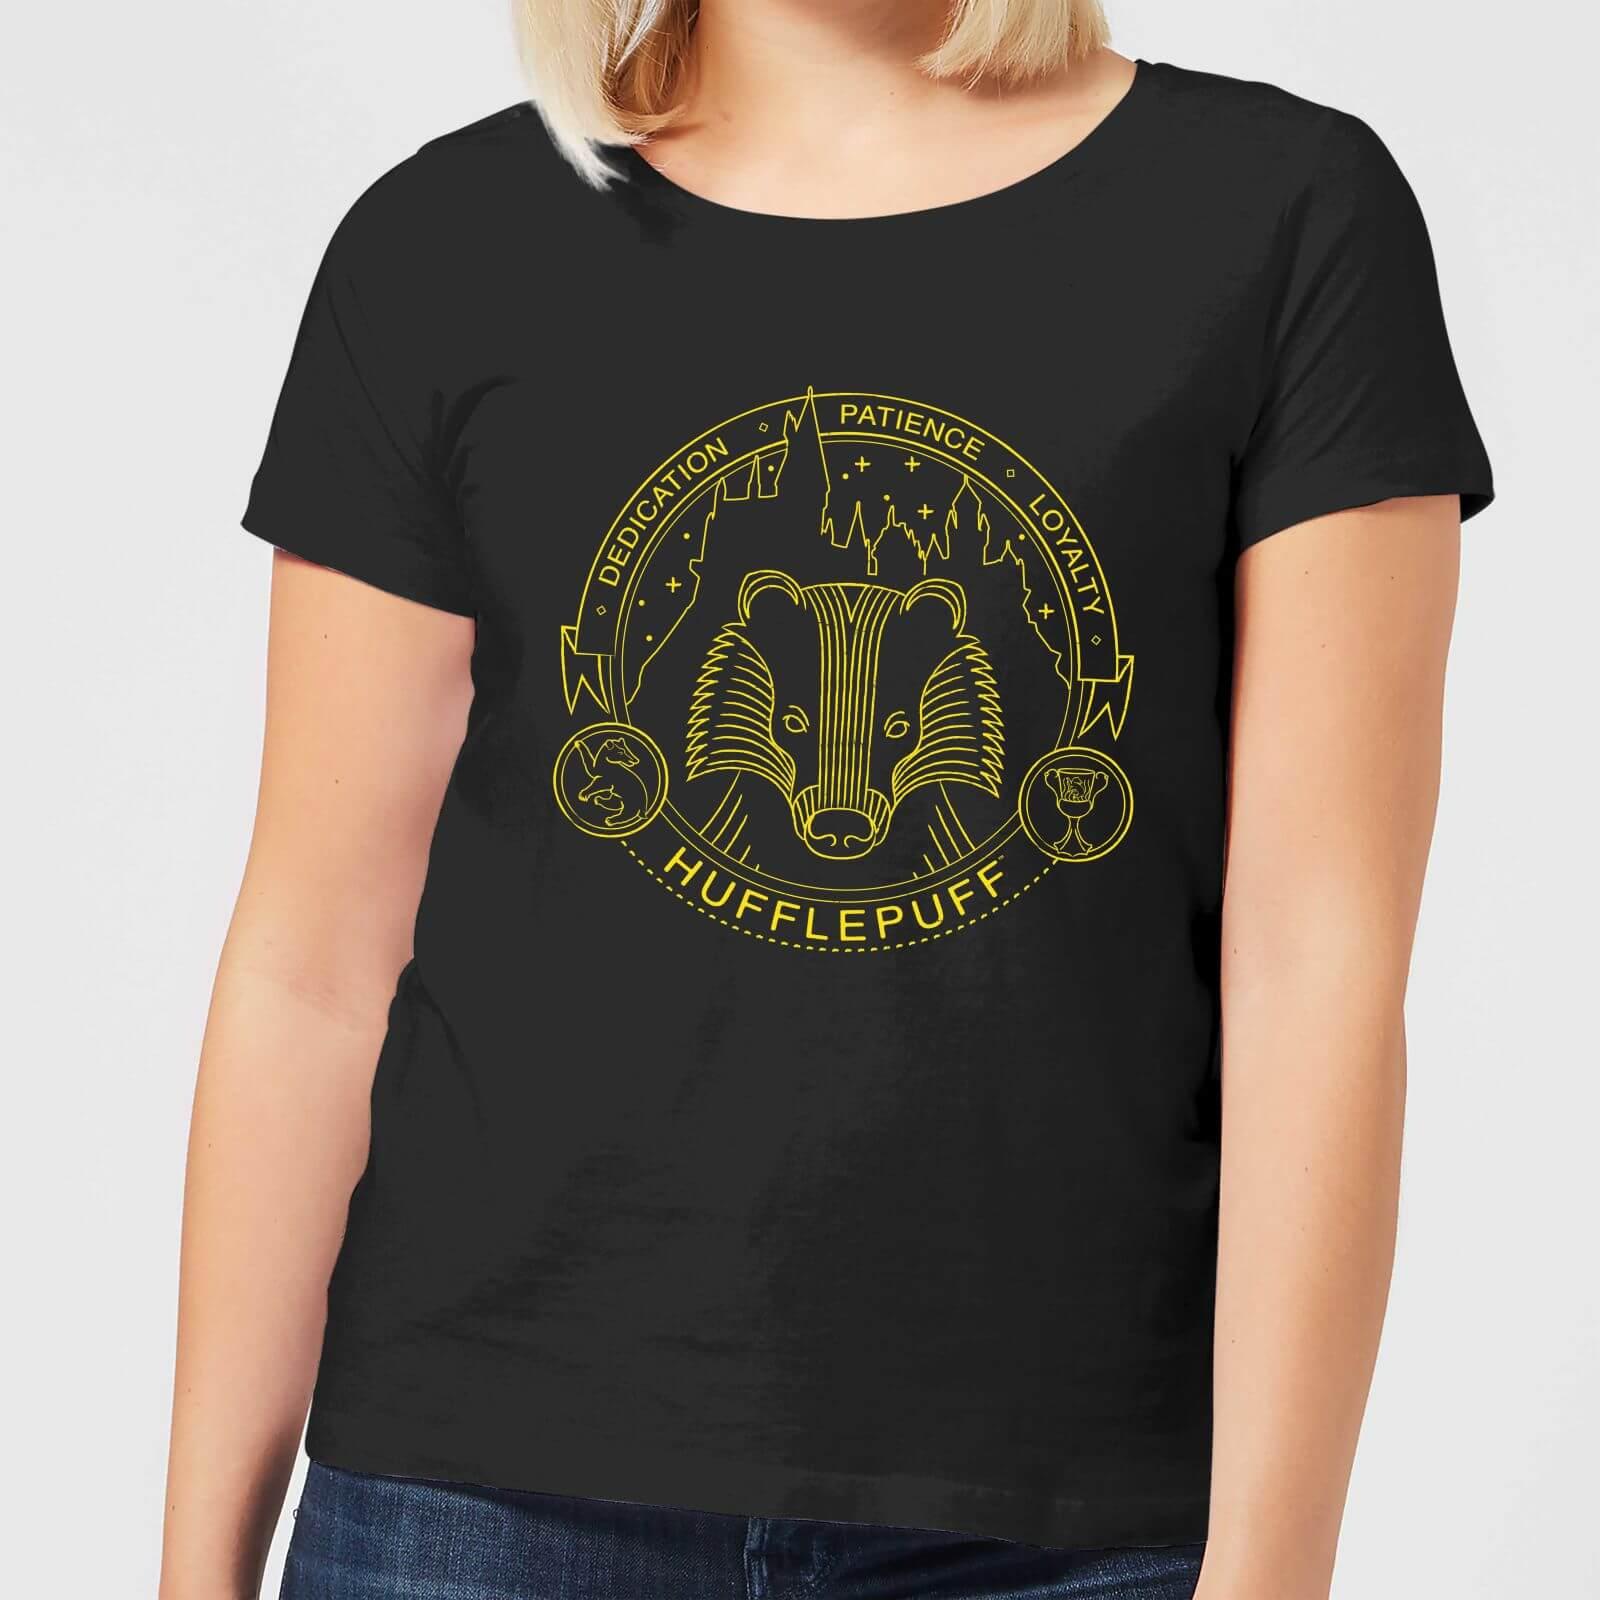 99f996a9 Harry Potter Hufflepuff Badger Badge Women's T-Shirt - Black Clothing    Zavvi